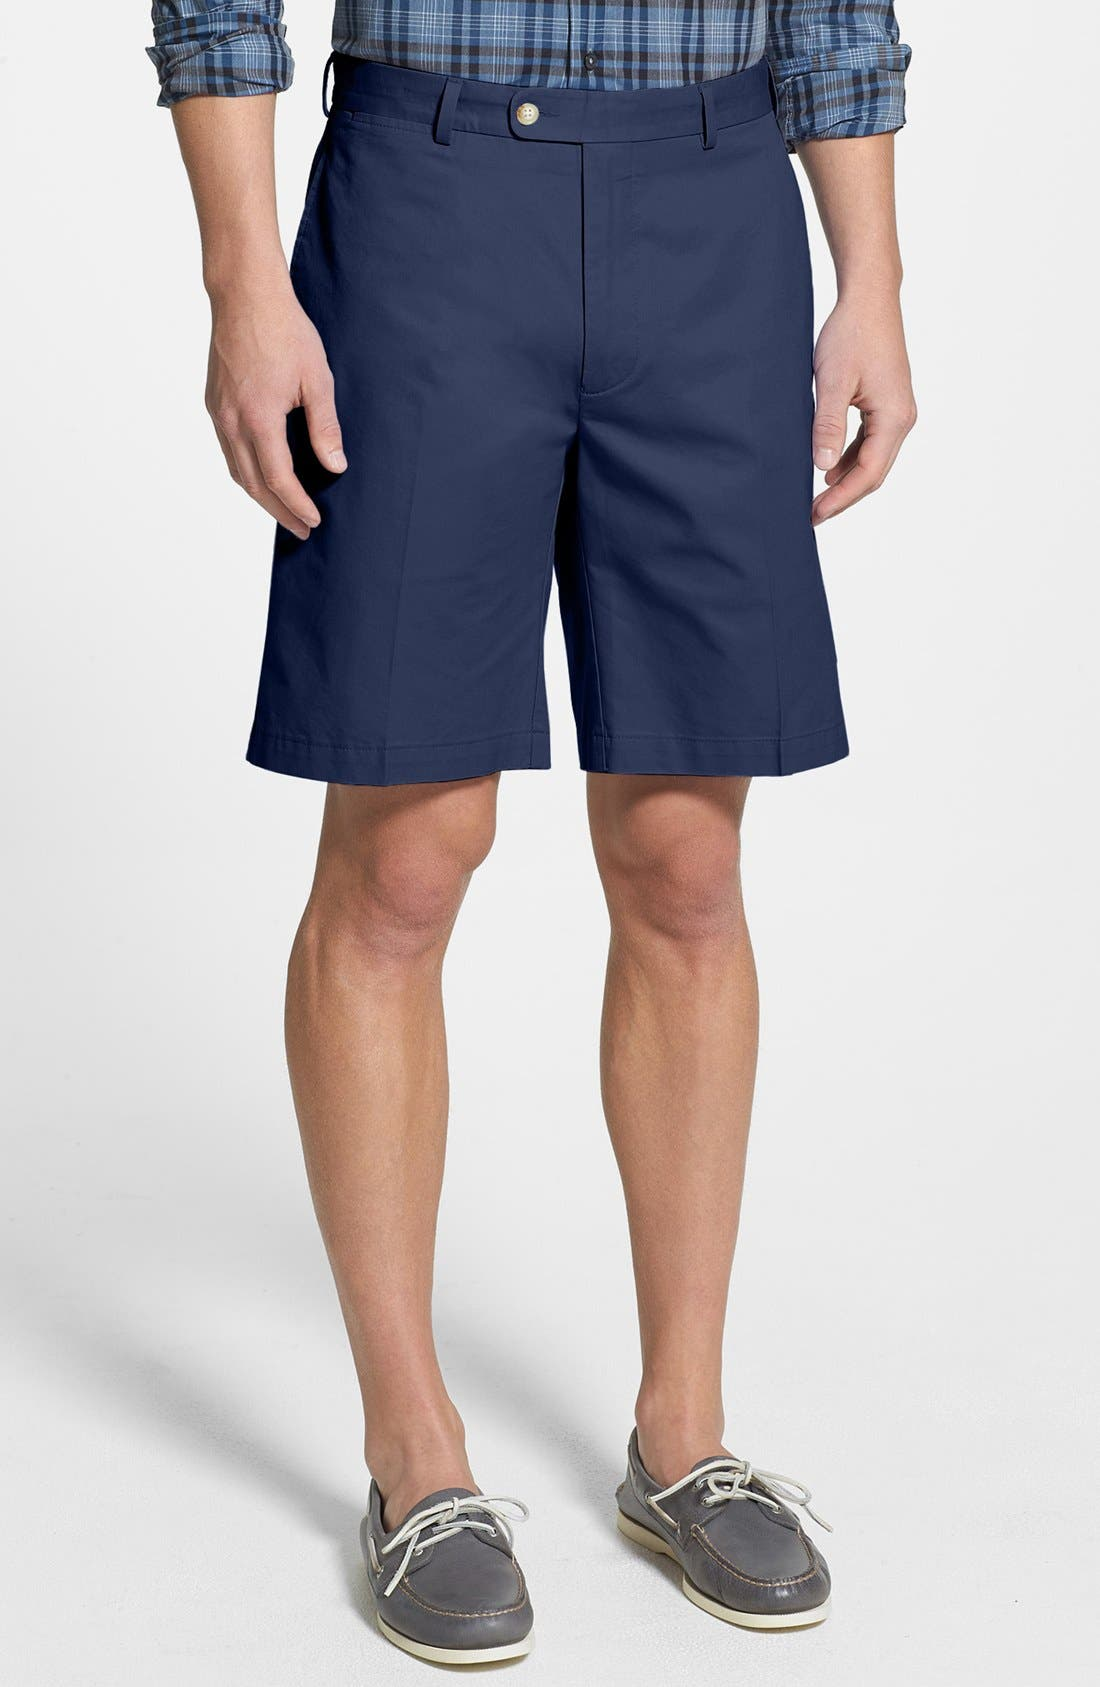 Alternate Image 1 Selected - Peter Millar Lightweight Cotton Shorts